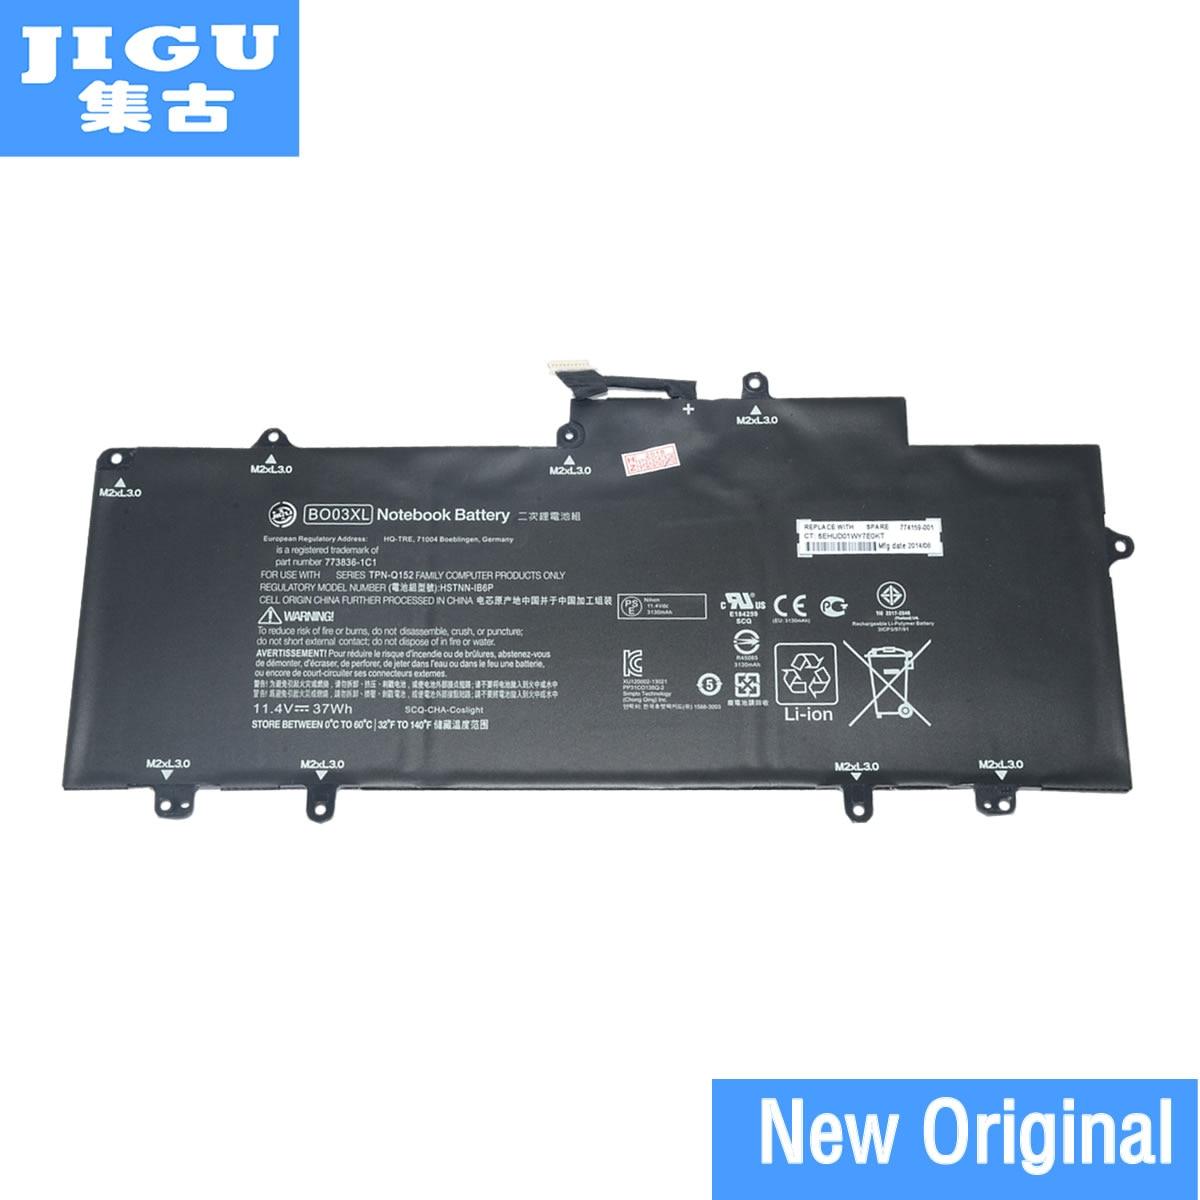 JIGU Original Laptop Battery 751895-1C1 752235-005 BO03XL HSTNN-IB6C 773836-1B1 HSTNN-IB6P 773836-1C1 TPN-Q137 For HP